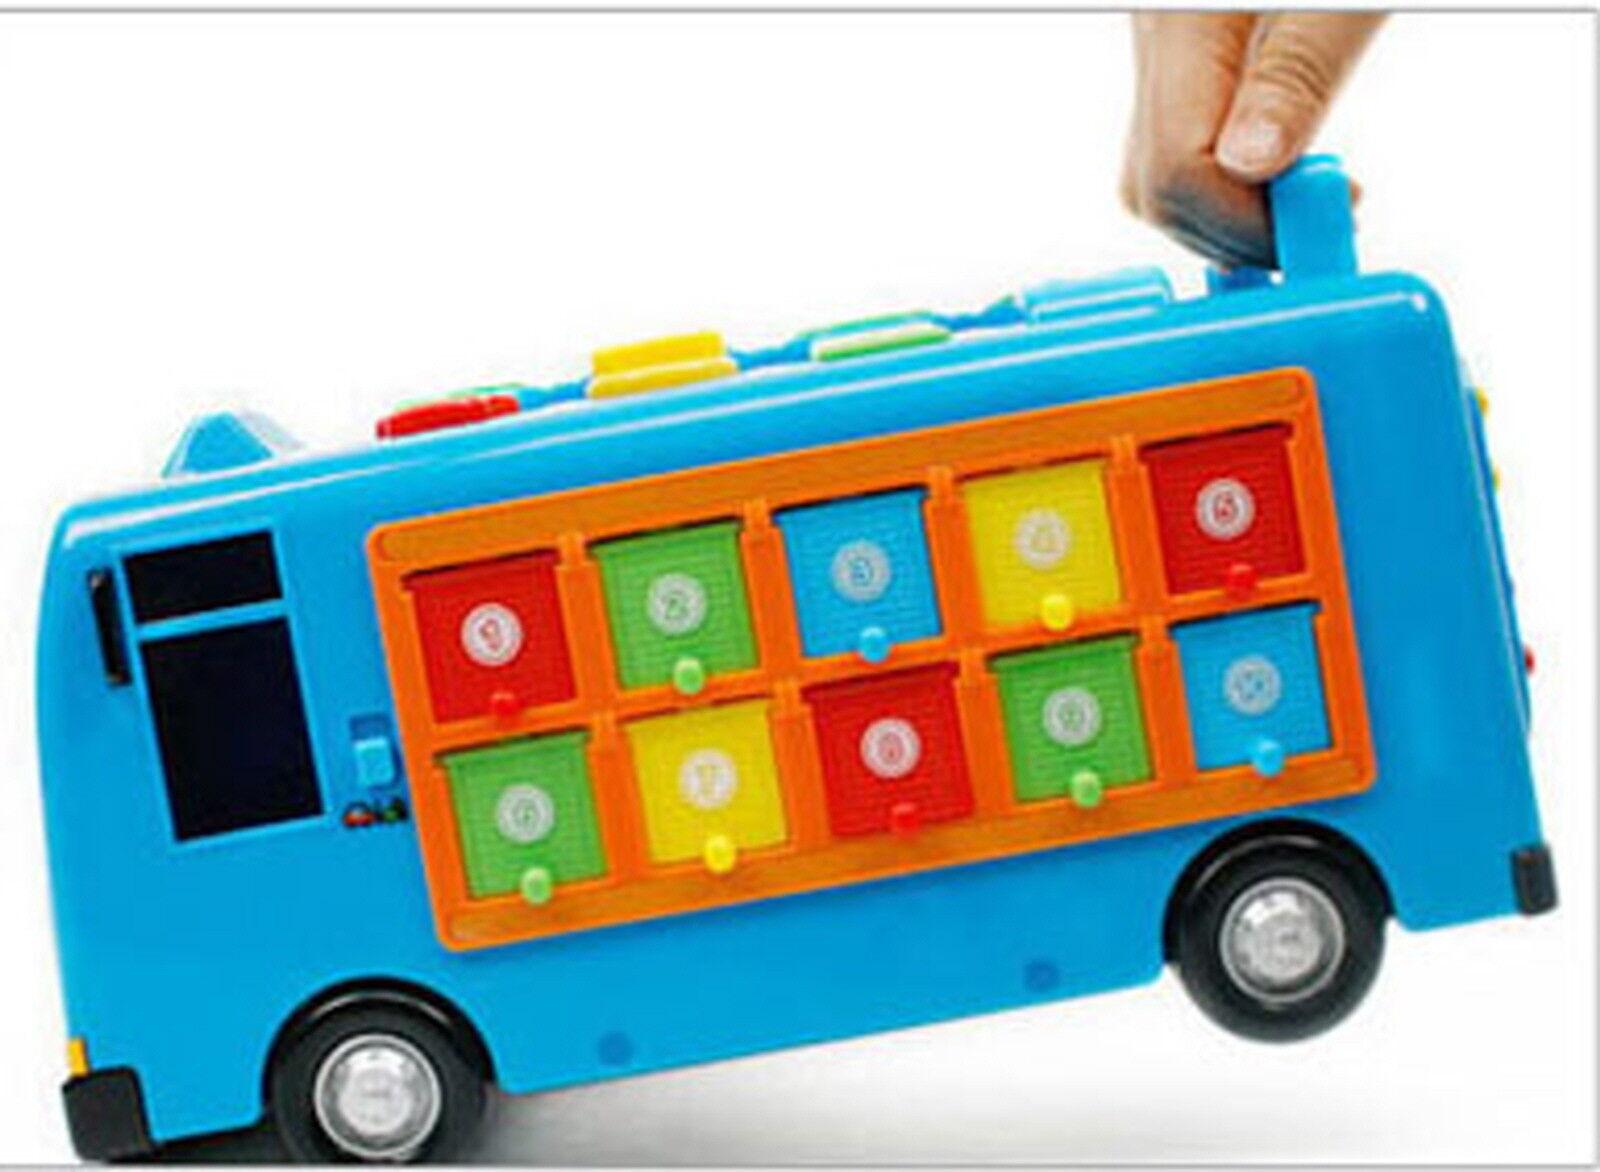 Little Bus Smart Tayo Bus Educational Learning Toy Talking Melody Melody Melody Korea Cartoon 066e01